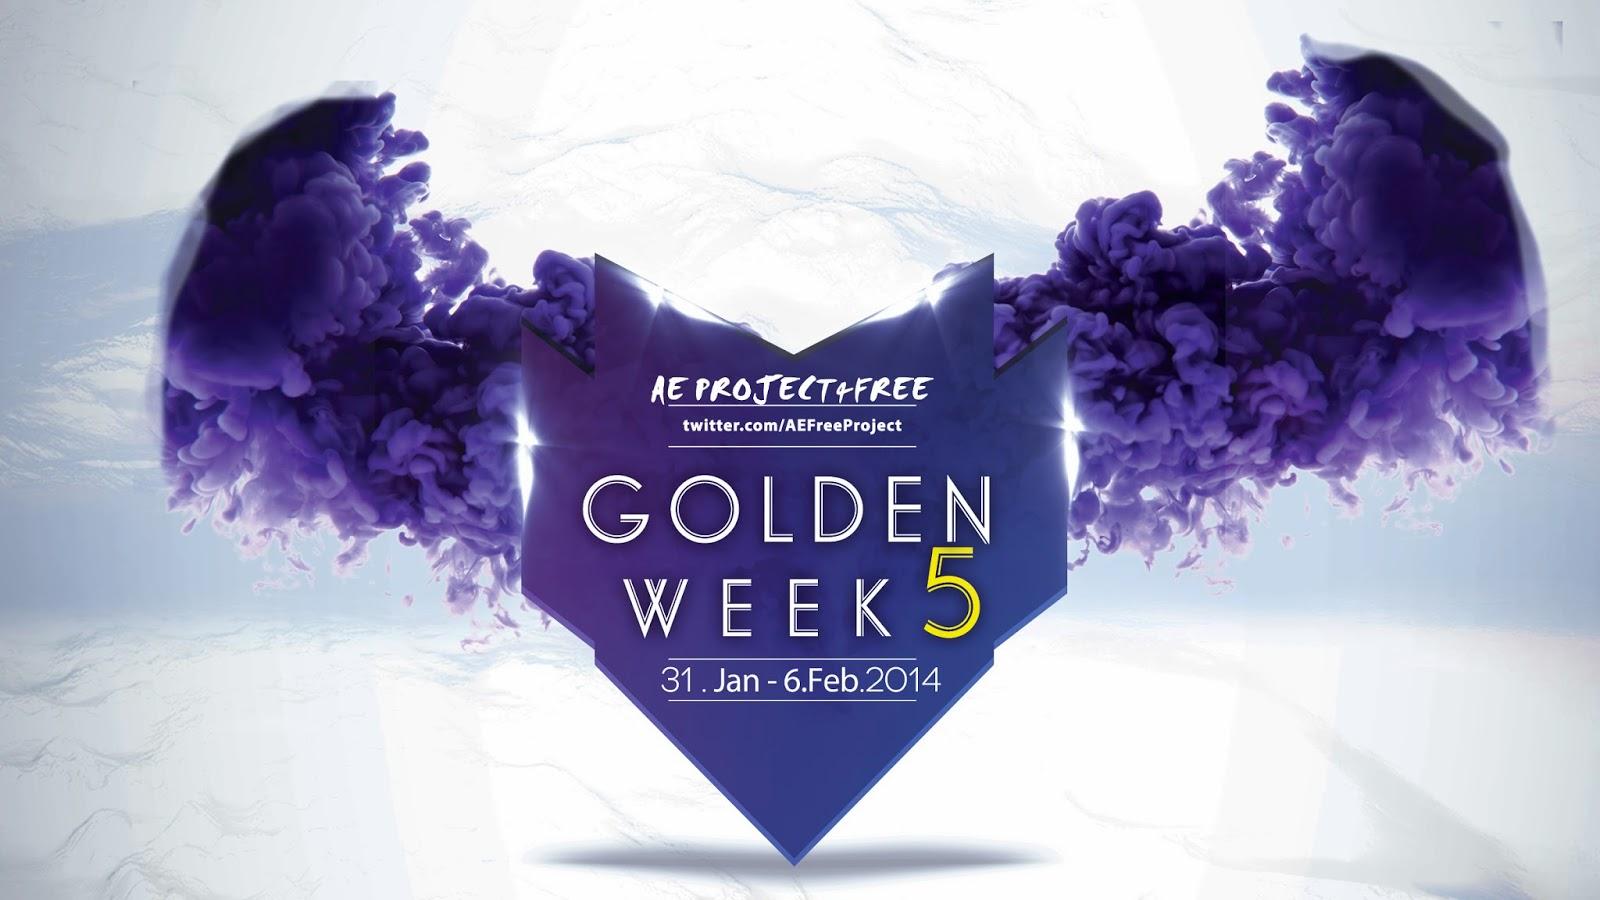 Golden Week 5